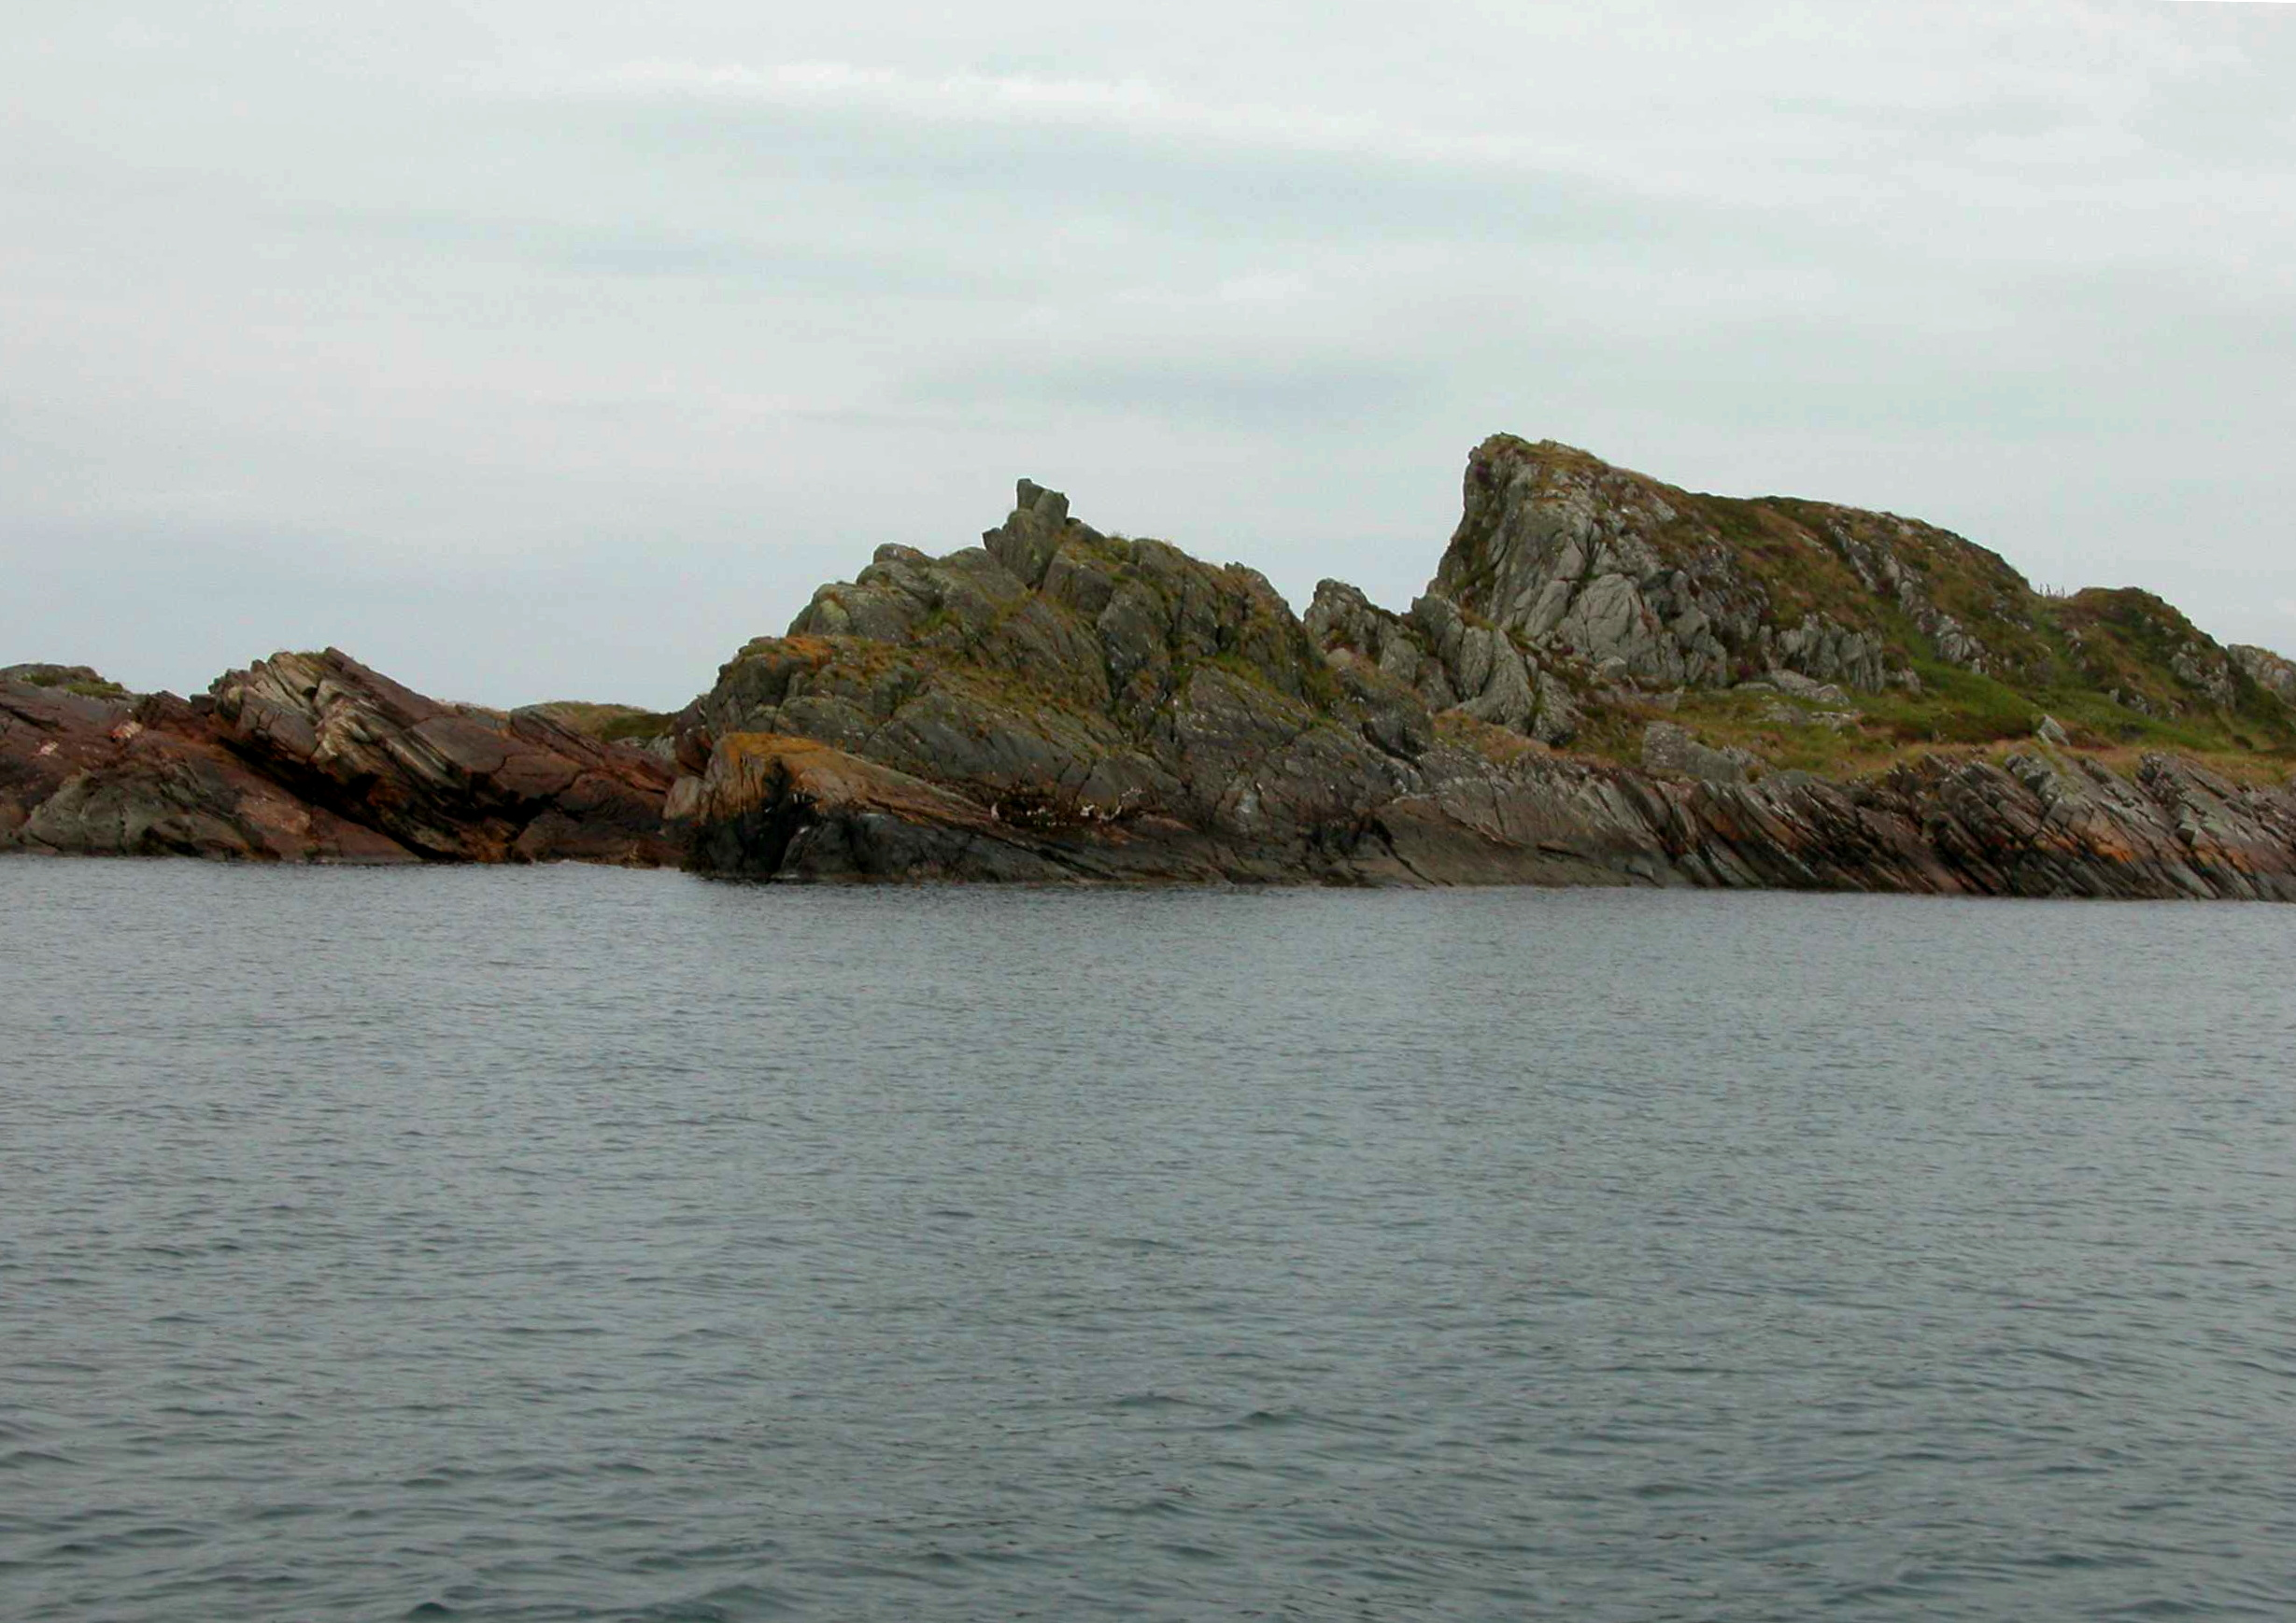 Coiresa Island